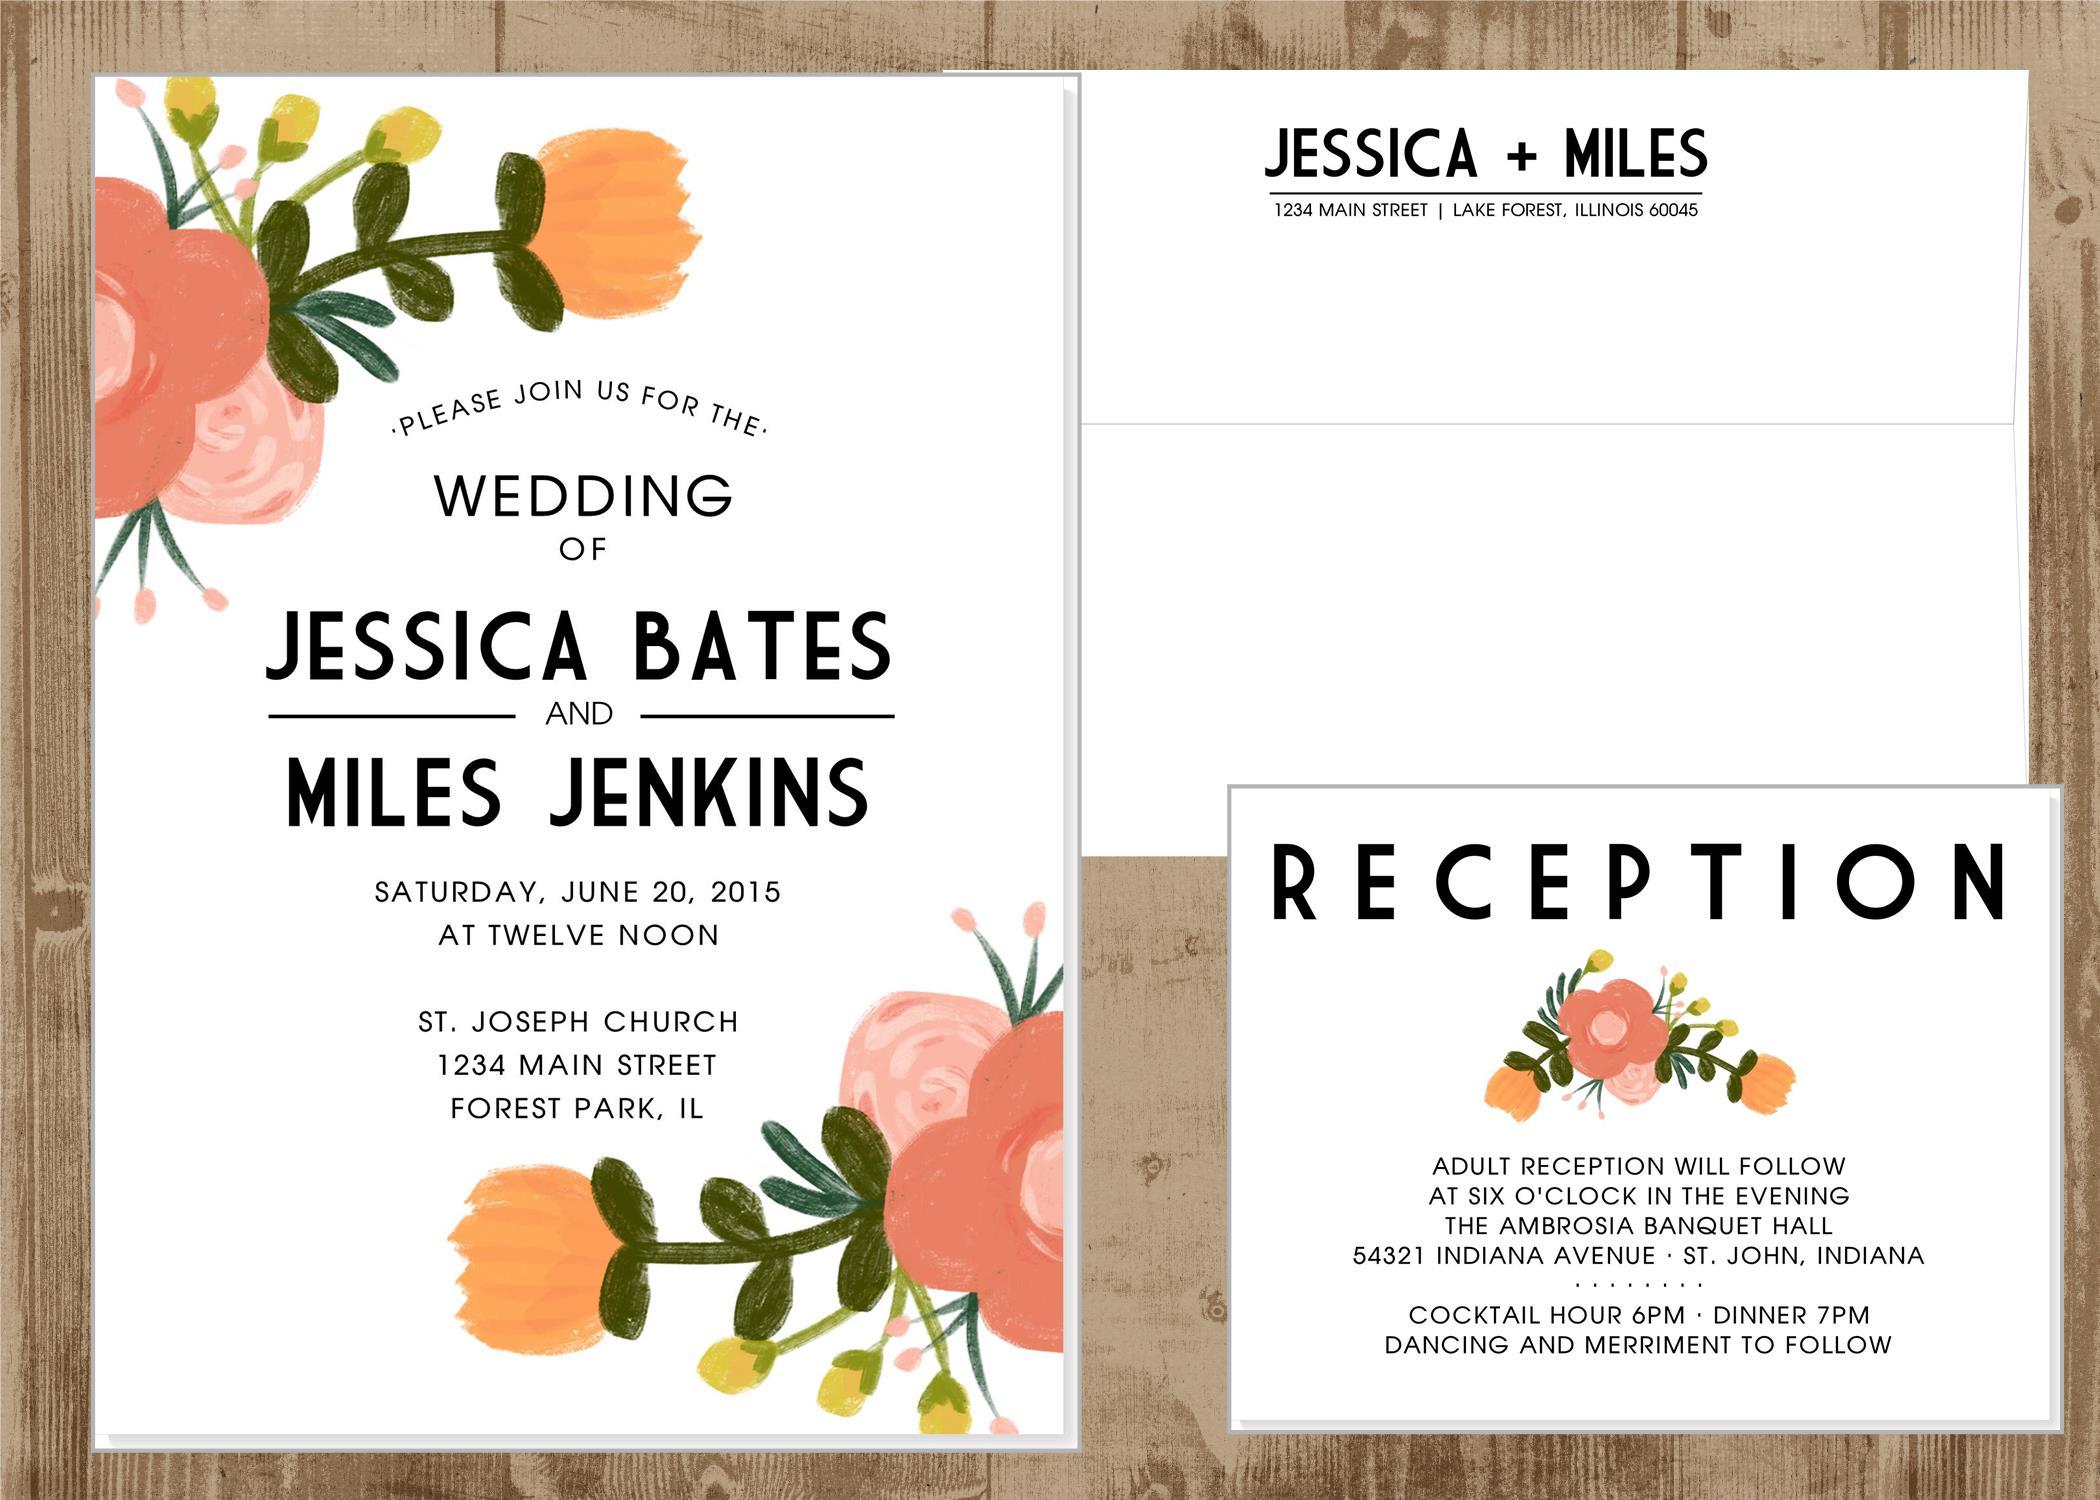 Printable Wedding Invitation Suite In Orange And Pink